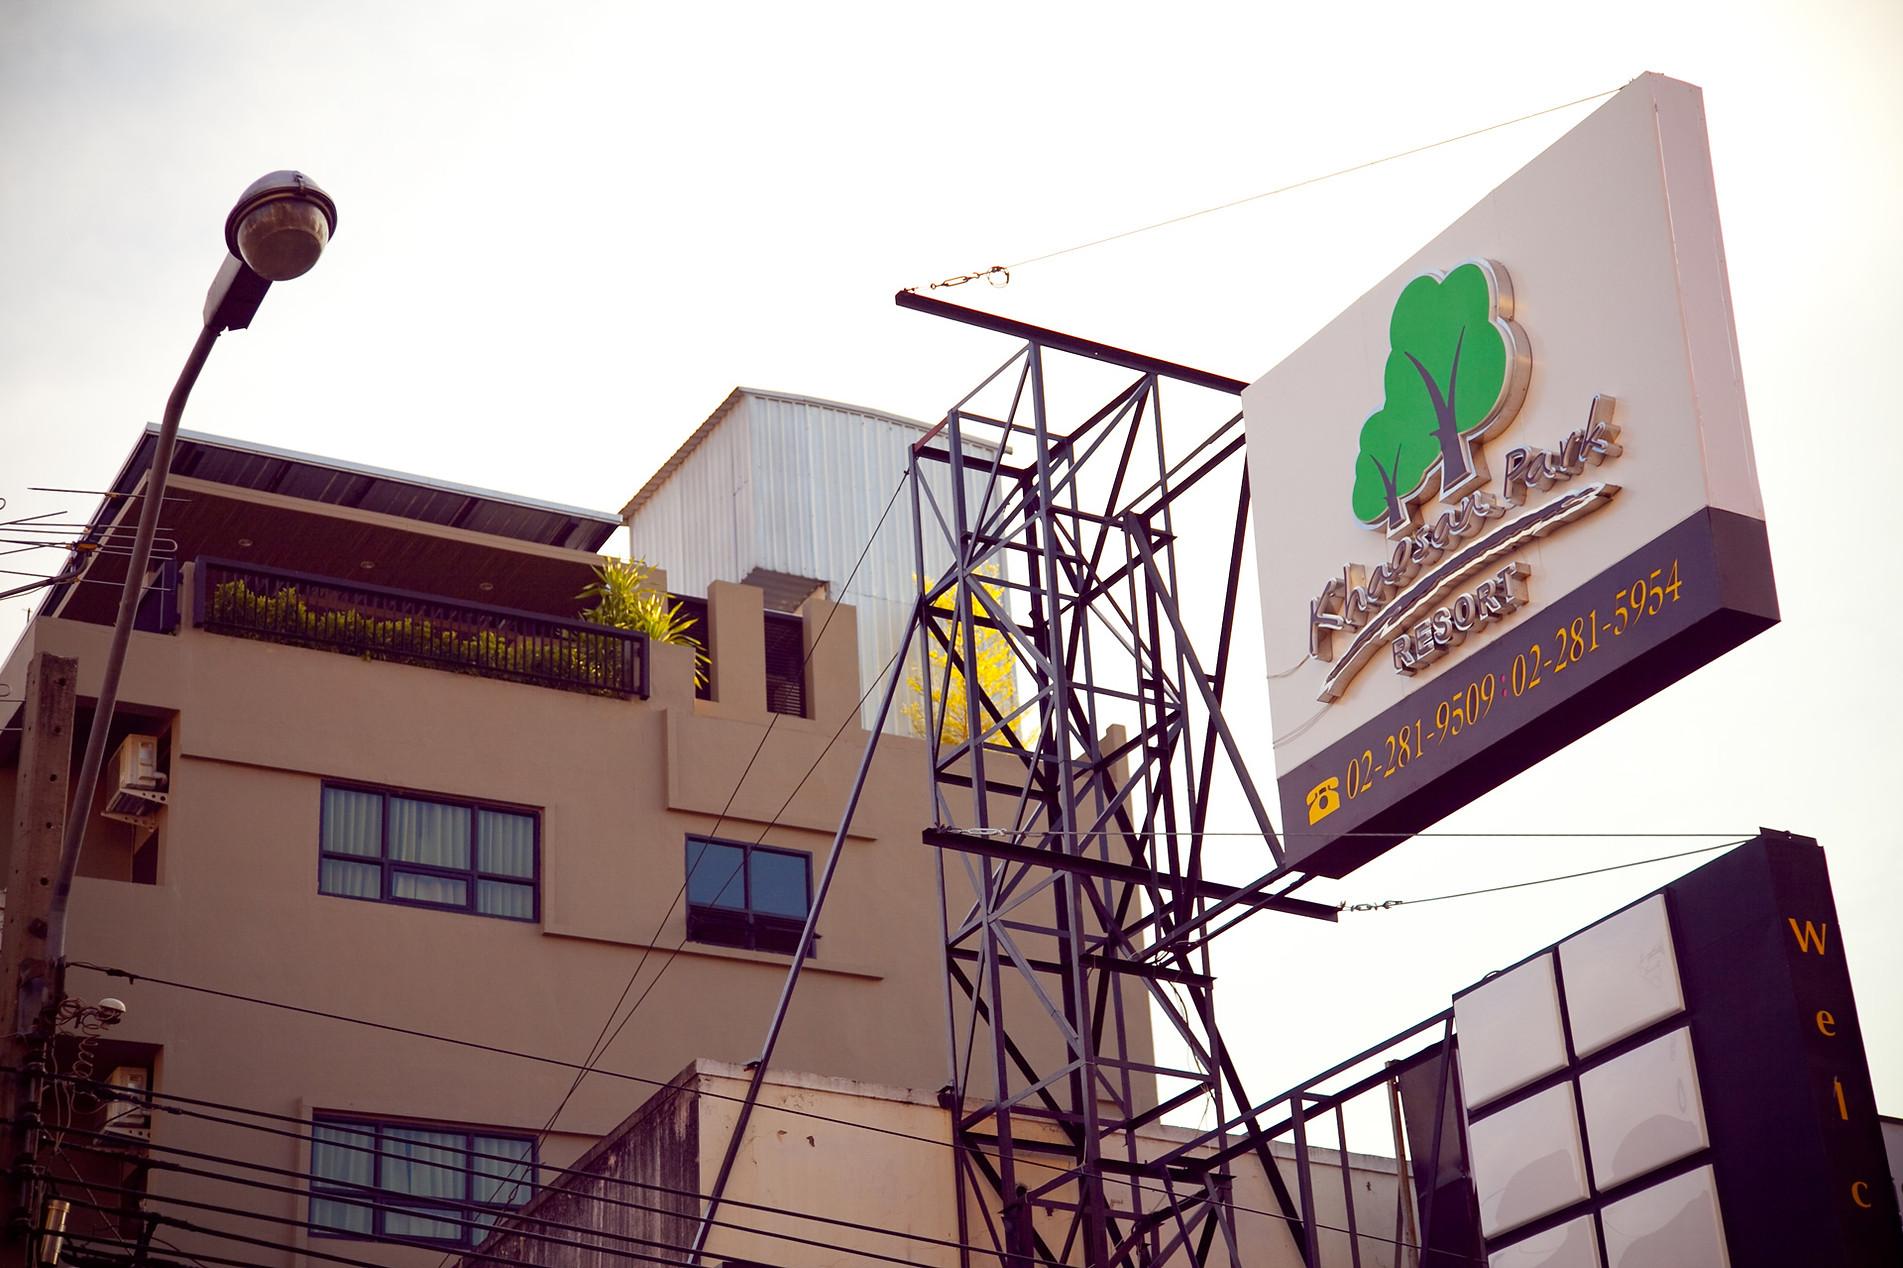 Khaosan Park Resort picpop